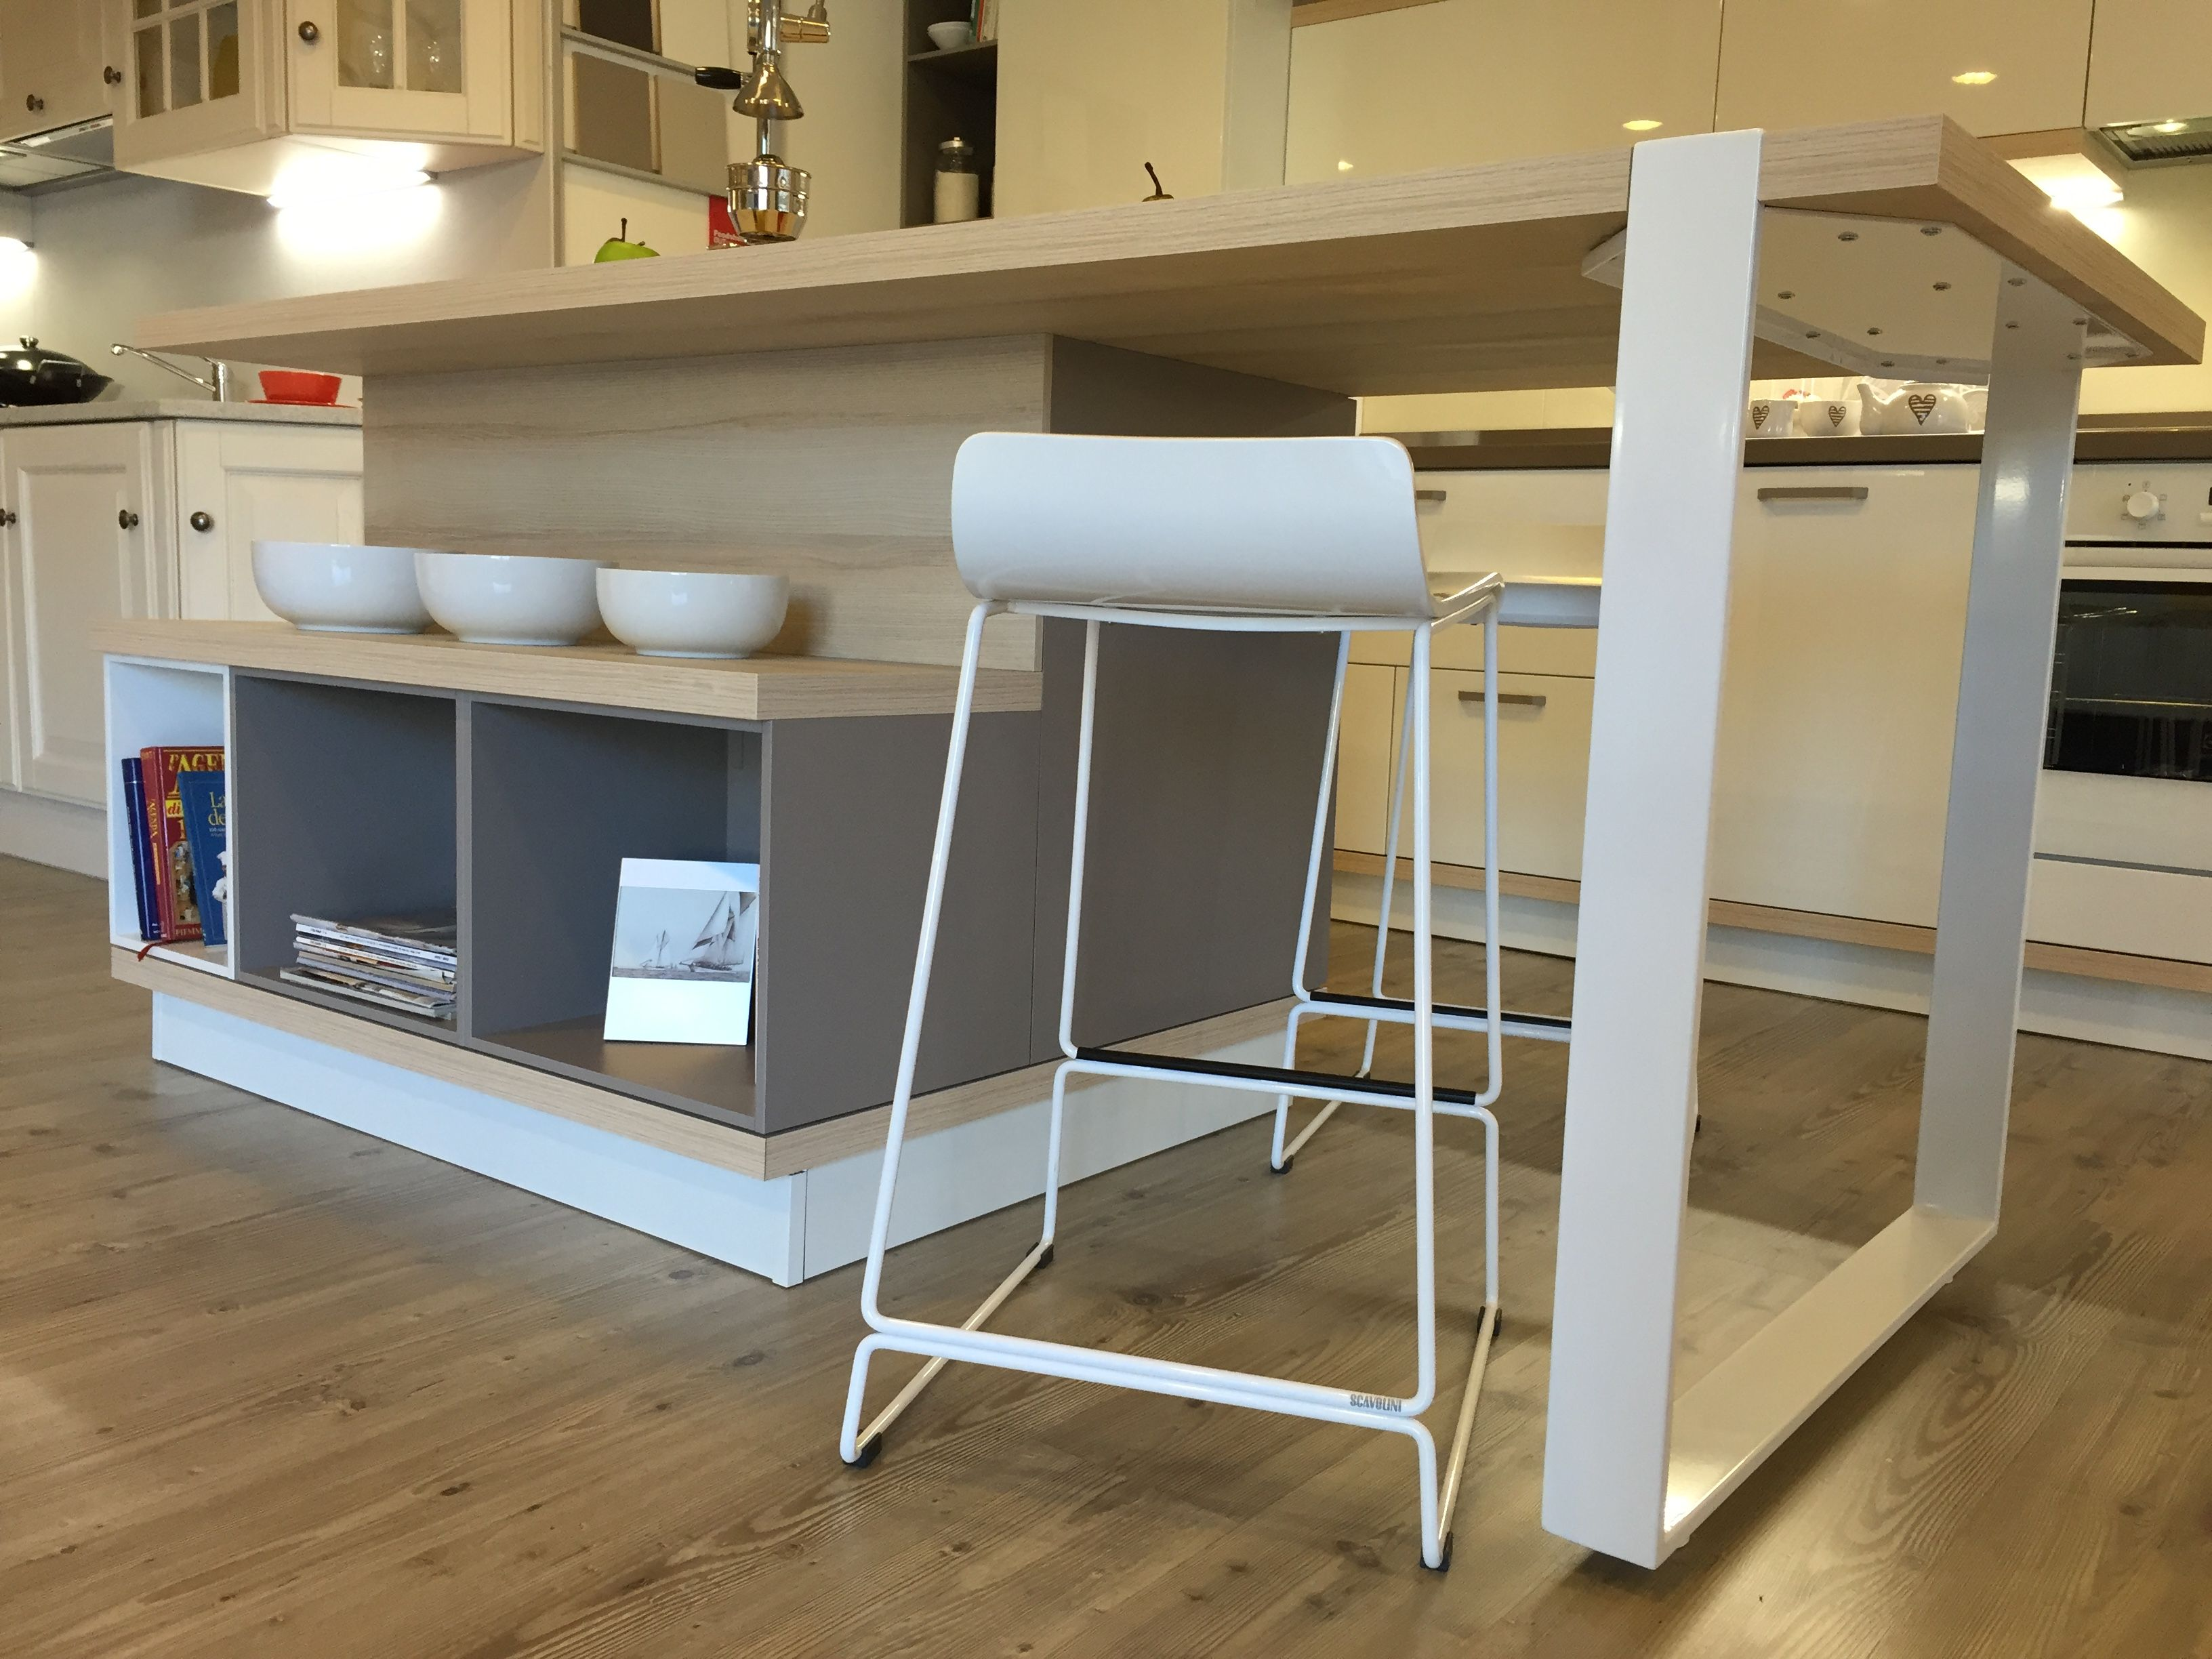 Cucina scavolini modello foodshelf kitchen arredamento